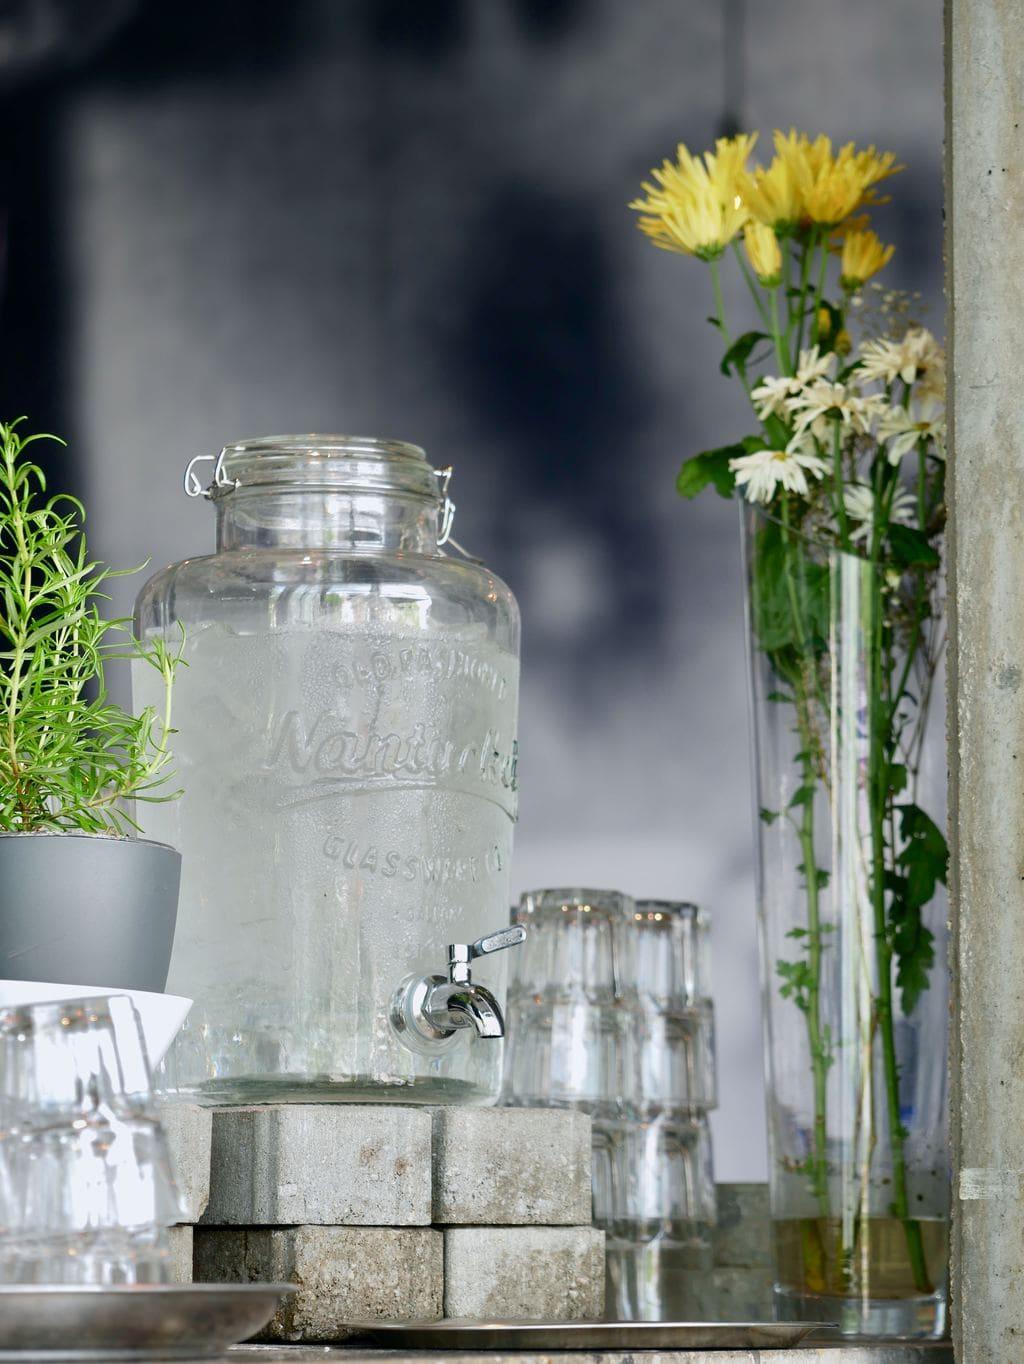 Mason jar pitcher full of water